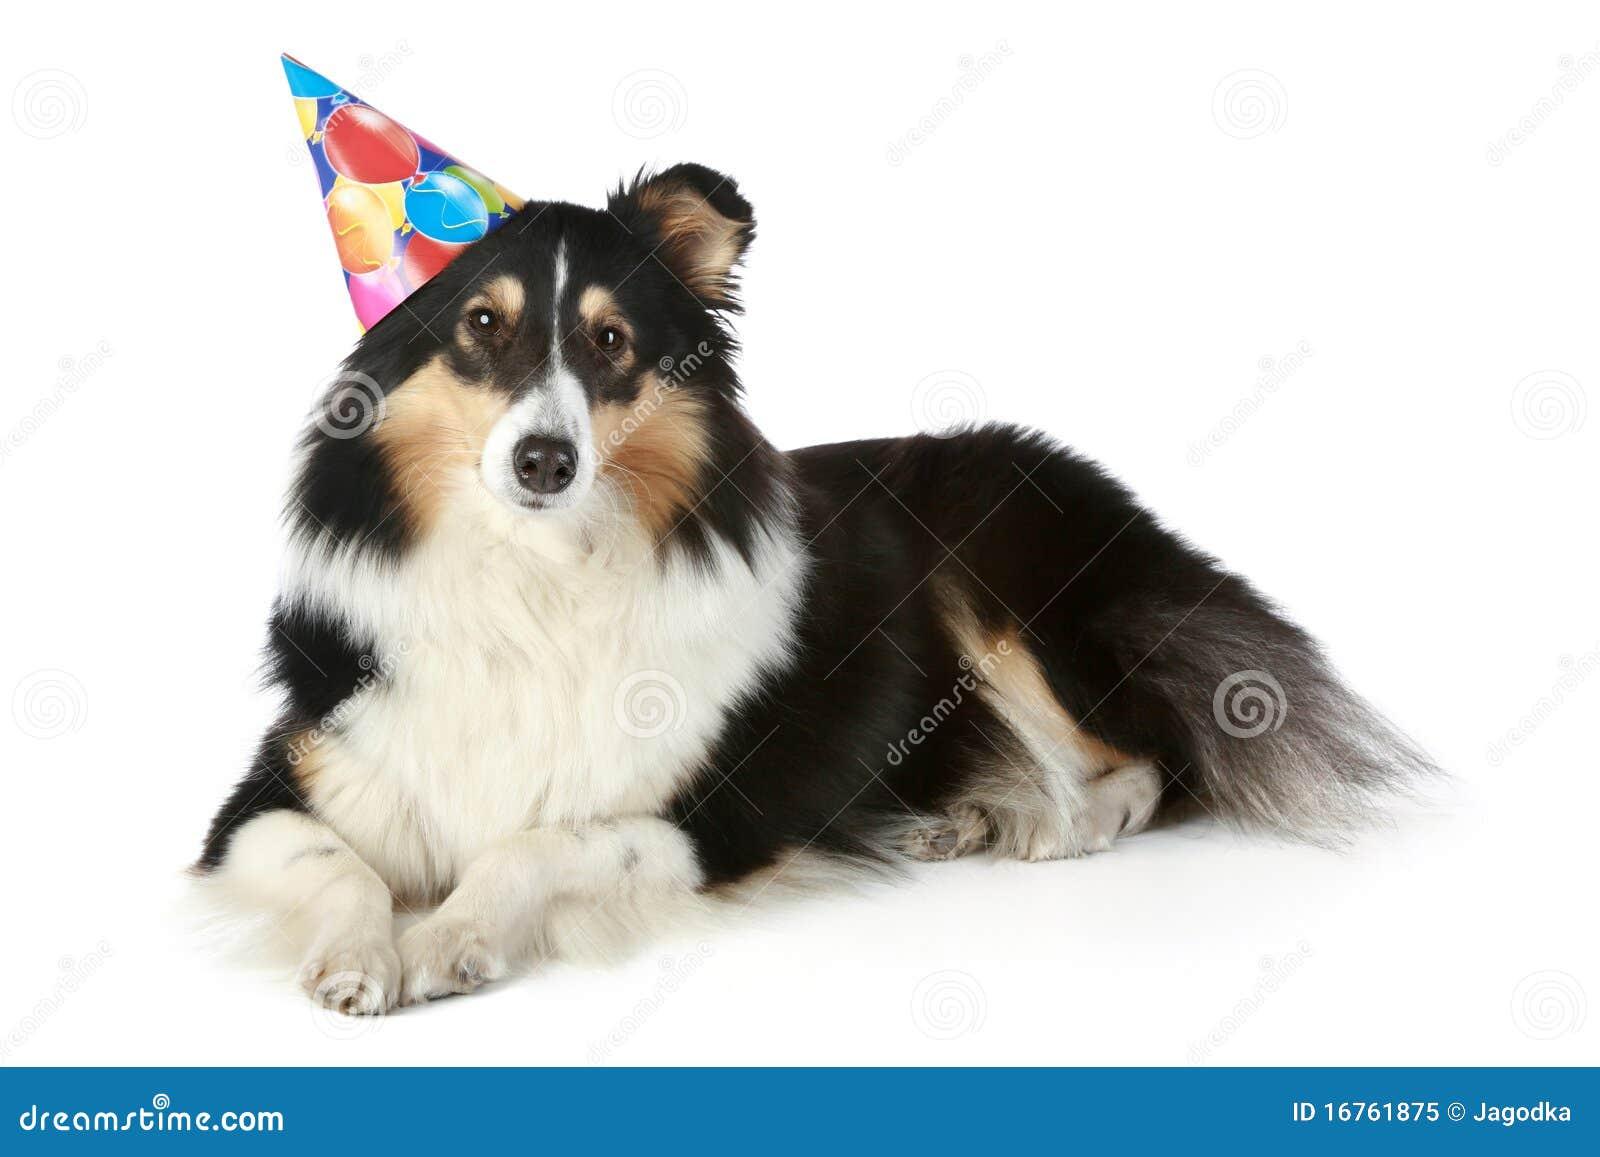 Hattdeltagaresheepdog shetland